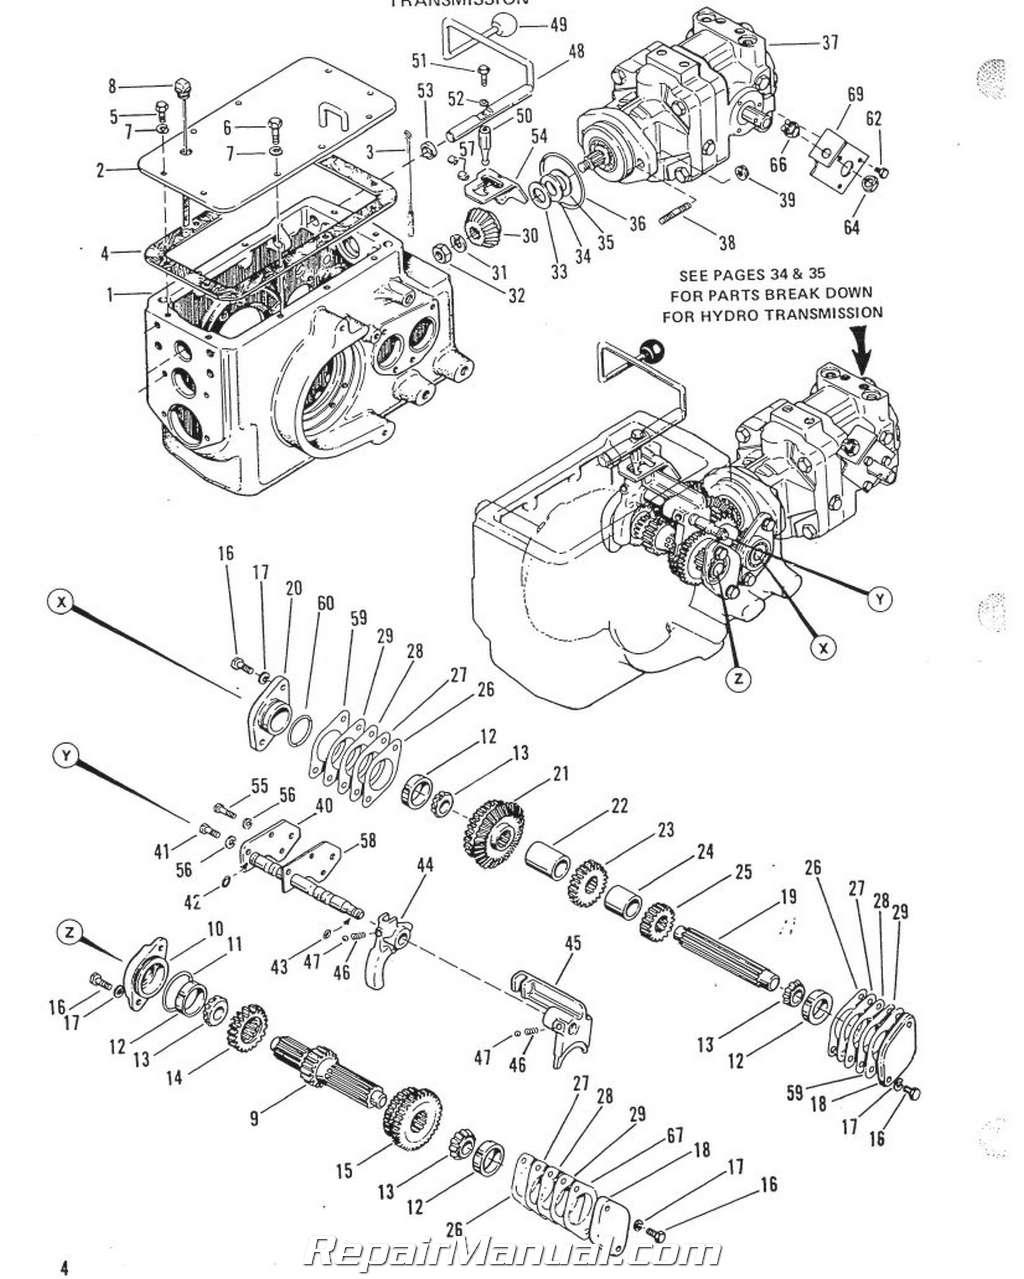 simplicity power max 9020 9020 allis chalmers 720 lawn garden Allis Chalmers Model C Tractor Wiring Diagram simplicity power max 9020 9020 allis chalmers 720 lawn garden chassis parts manual